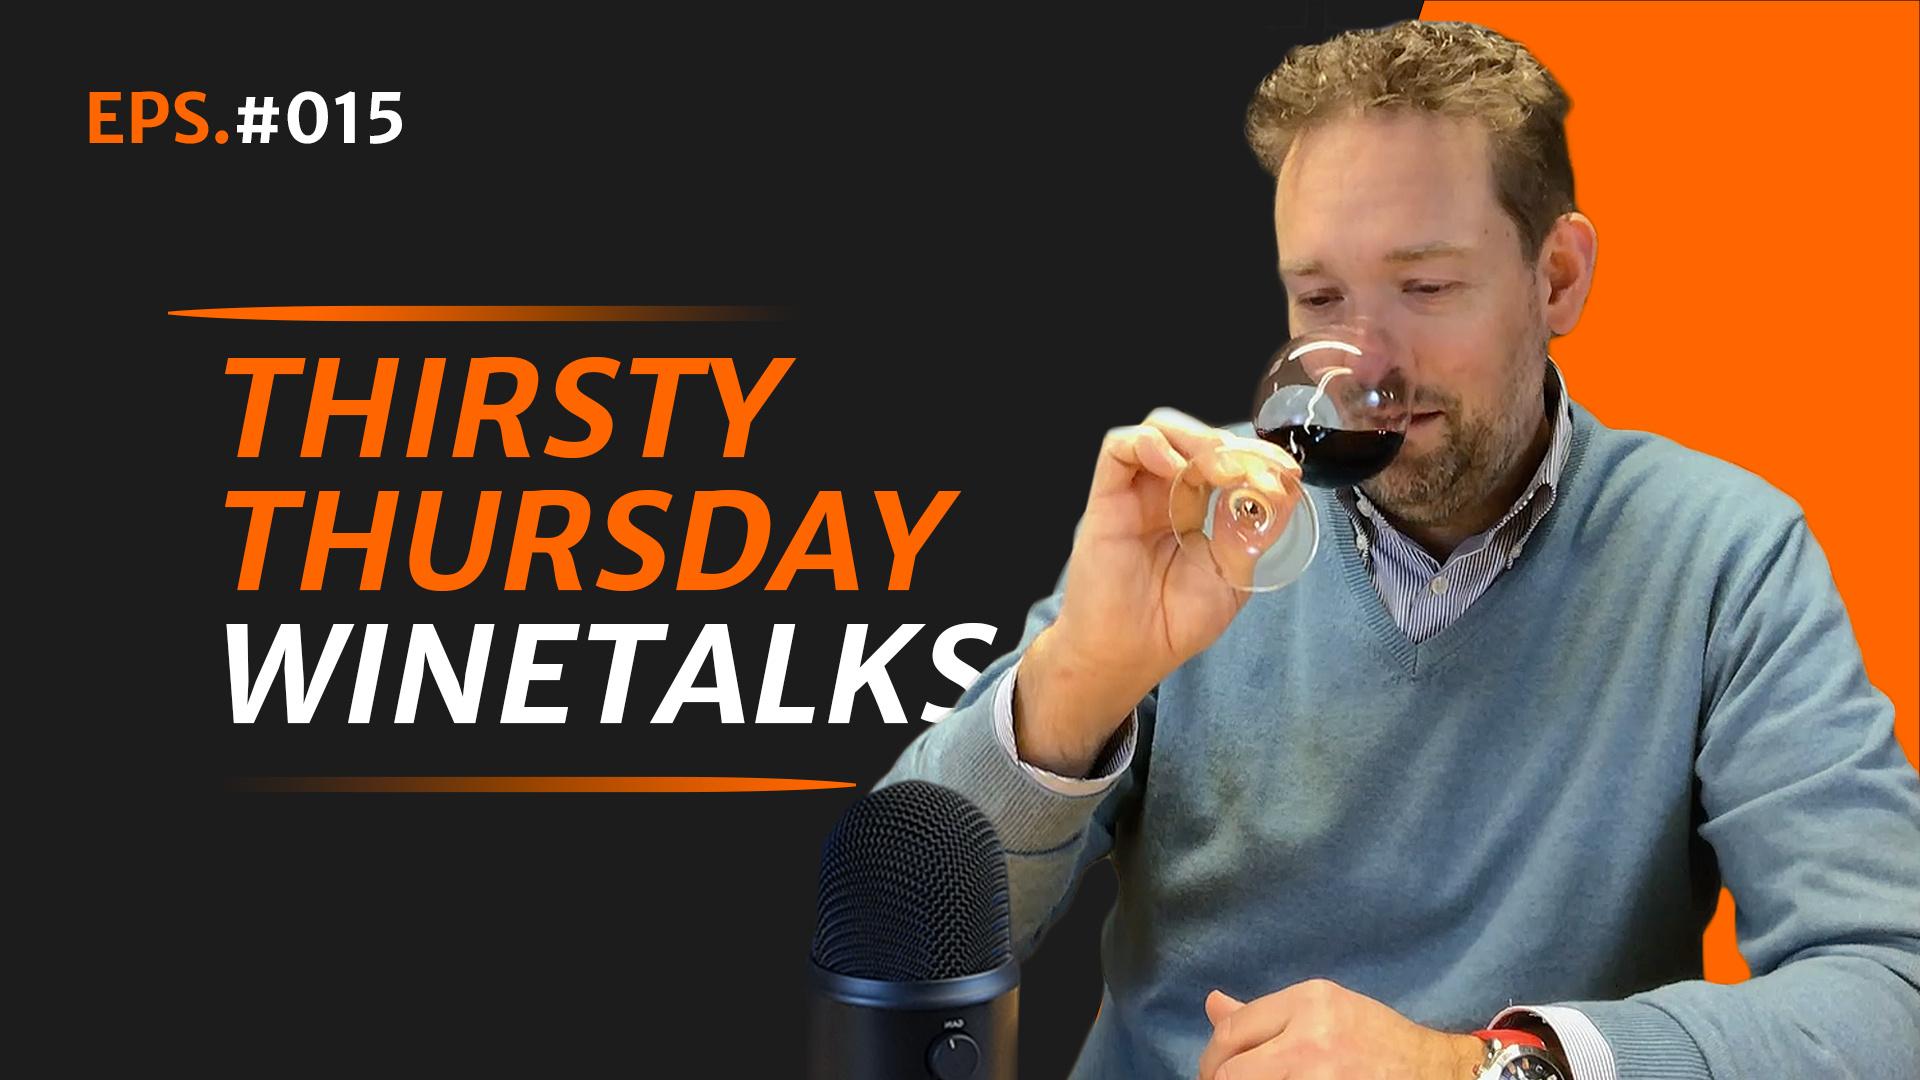 Thirsty Thirsday Winetalks #015